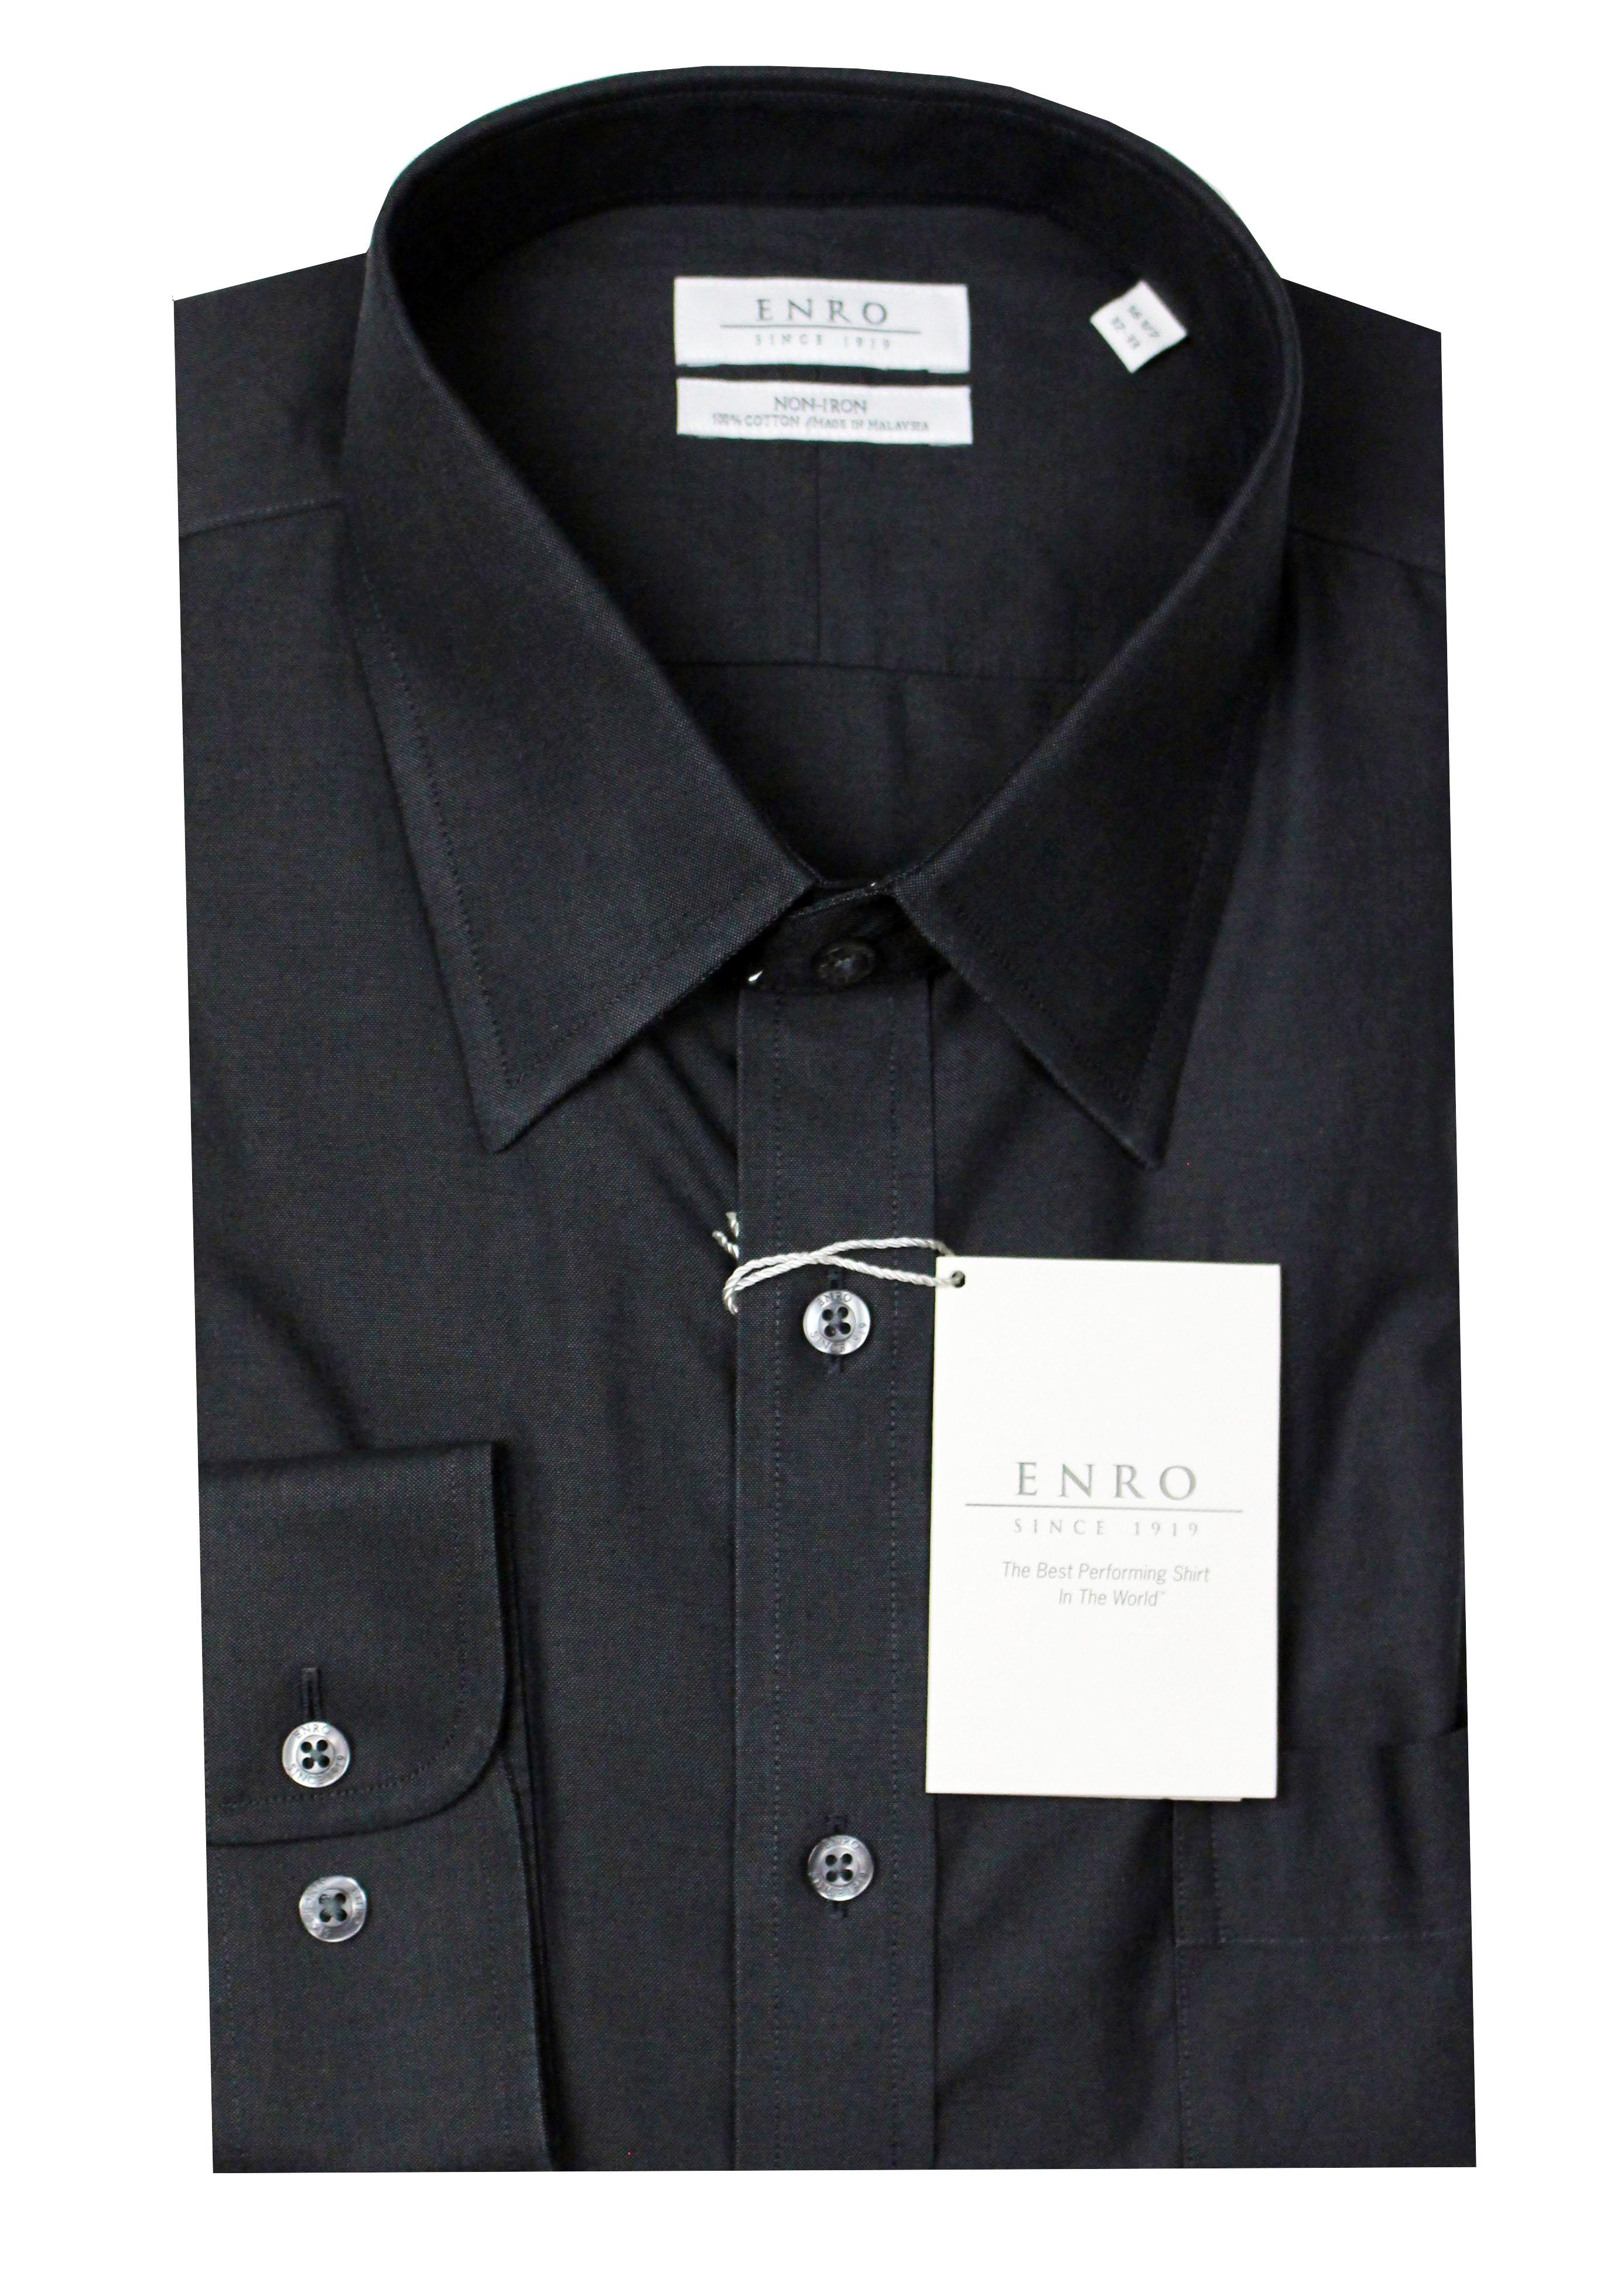 Enro men 39 s 100 cotton non iron point collar dress shirt for Men s no iron dress shirts